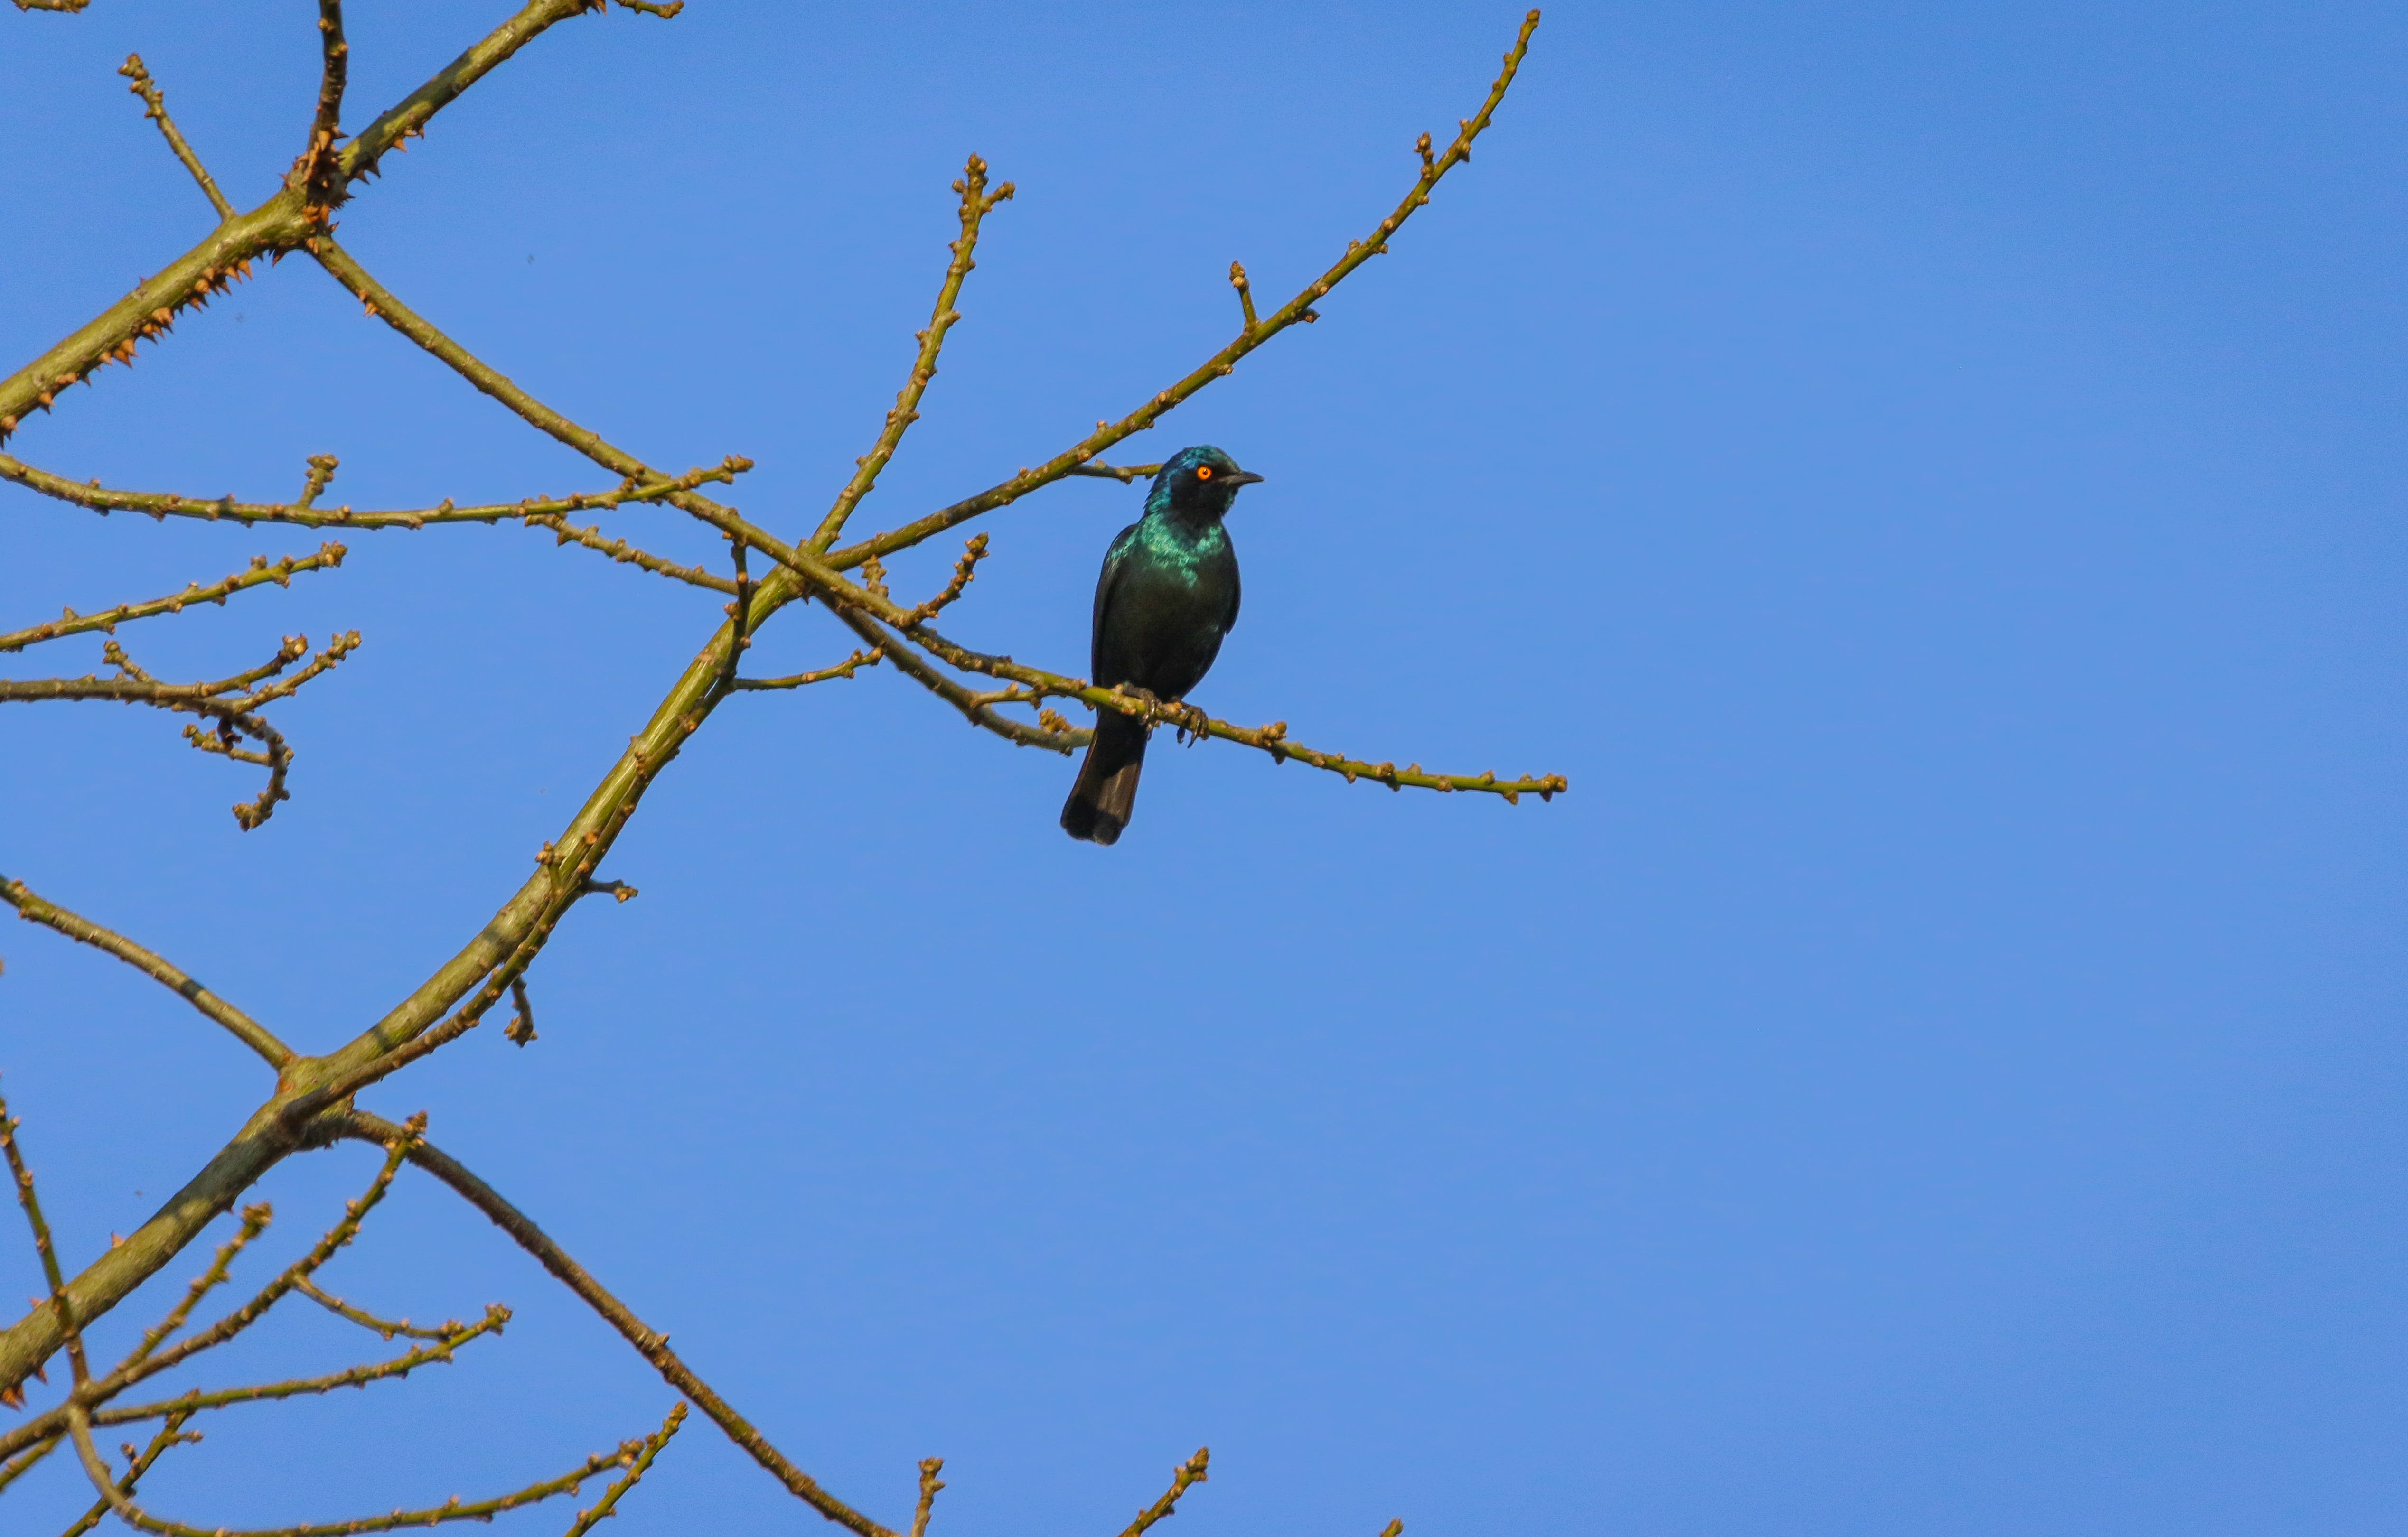 Free stock photo of nature, bird, tree, blue sky